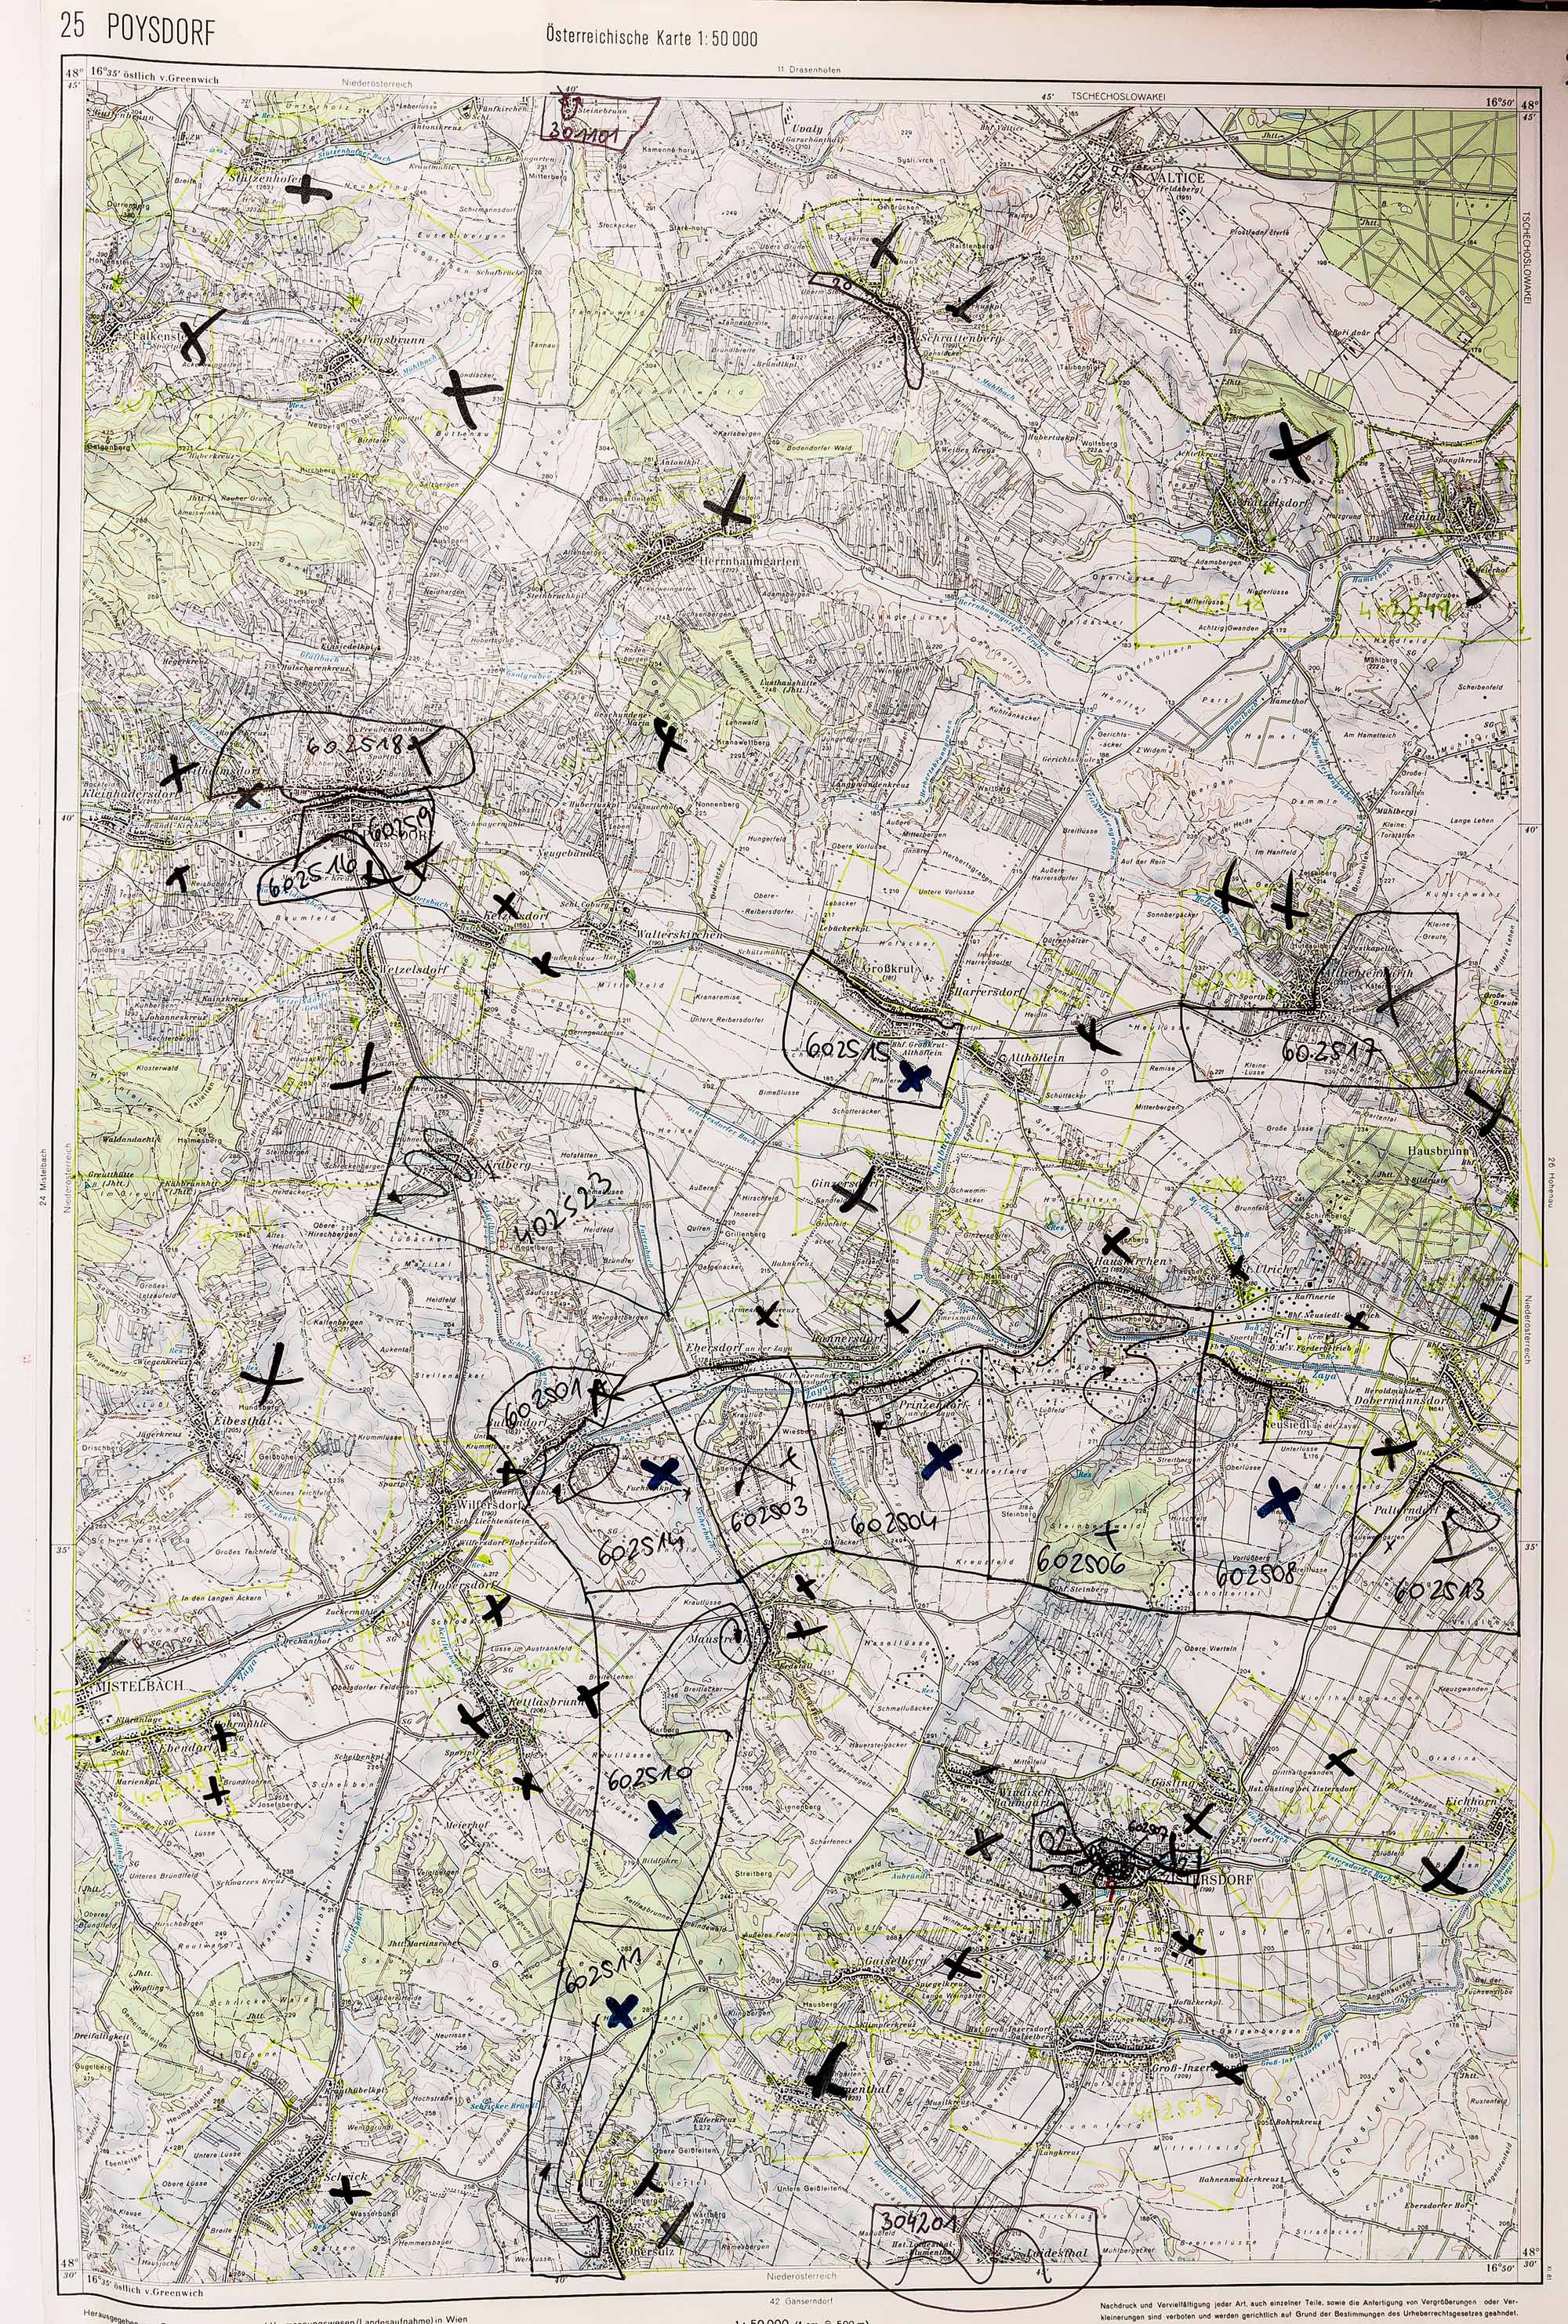 1983-1986 Karte 025